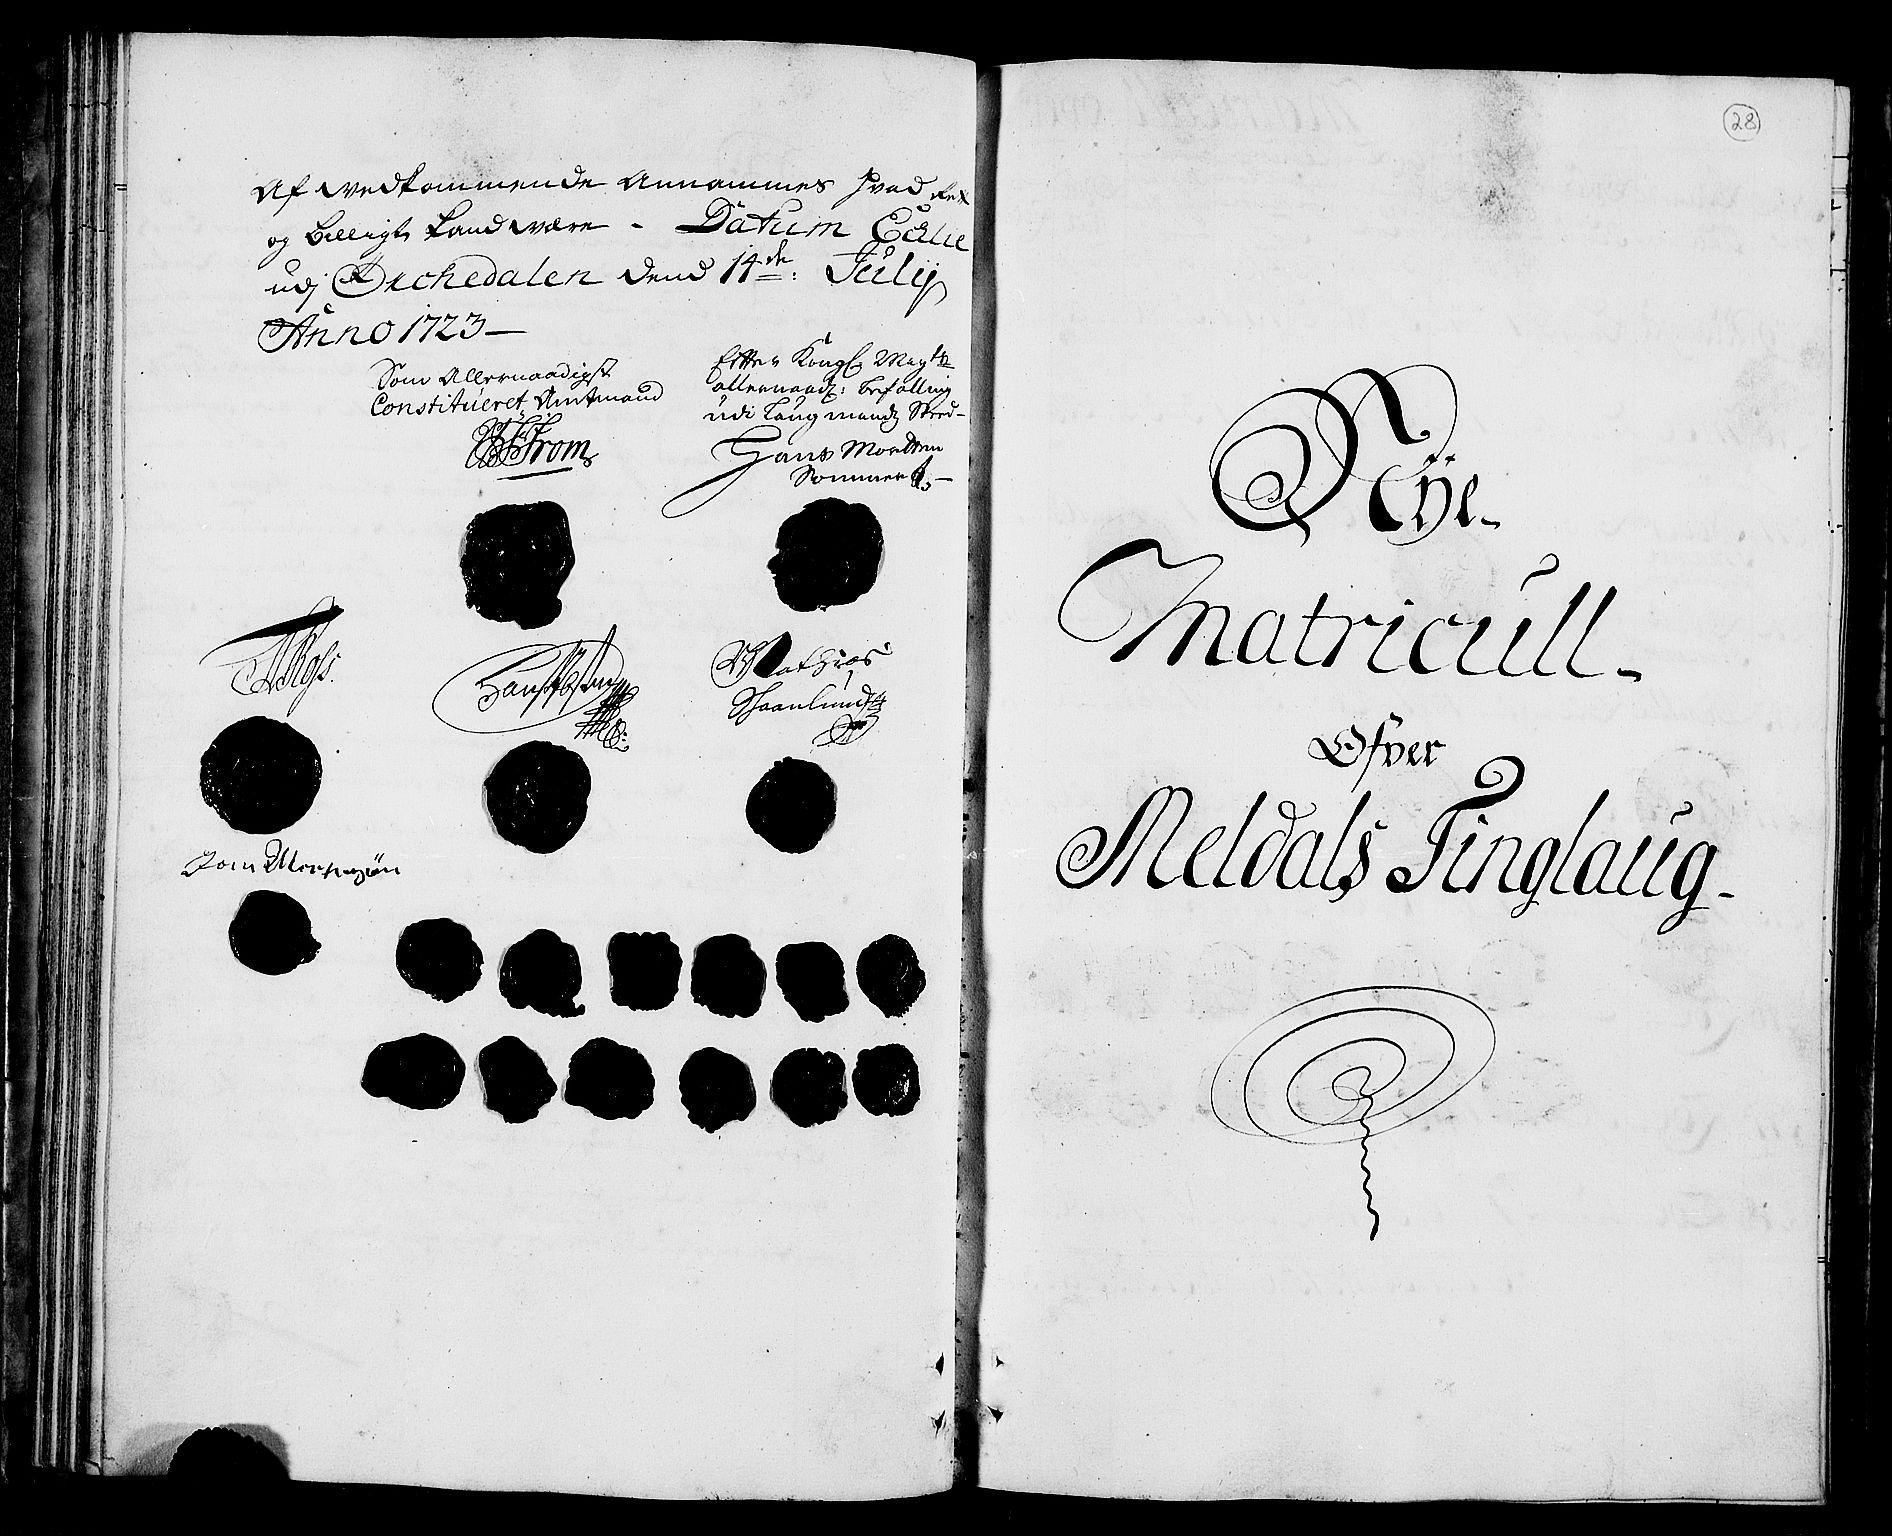 RA, Rentekammeret inntil 1814, Realistisk ordnet avdeling, N/Nb/Nbf/L0157: Orkdal matrikkelprotokoll, 1723, s. 27b-28a